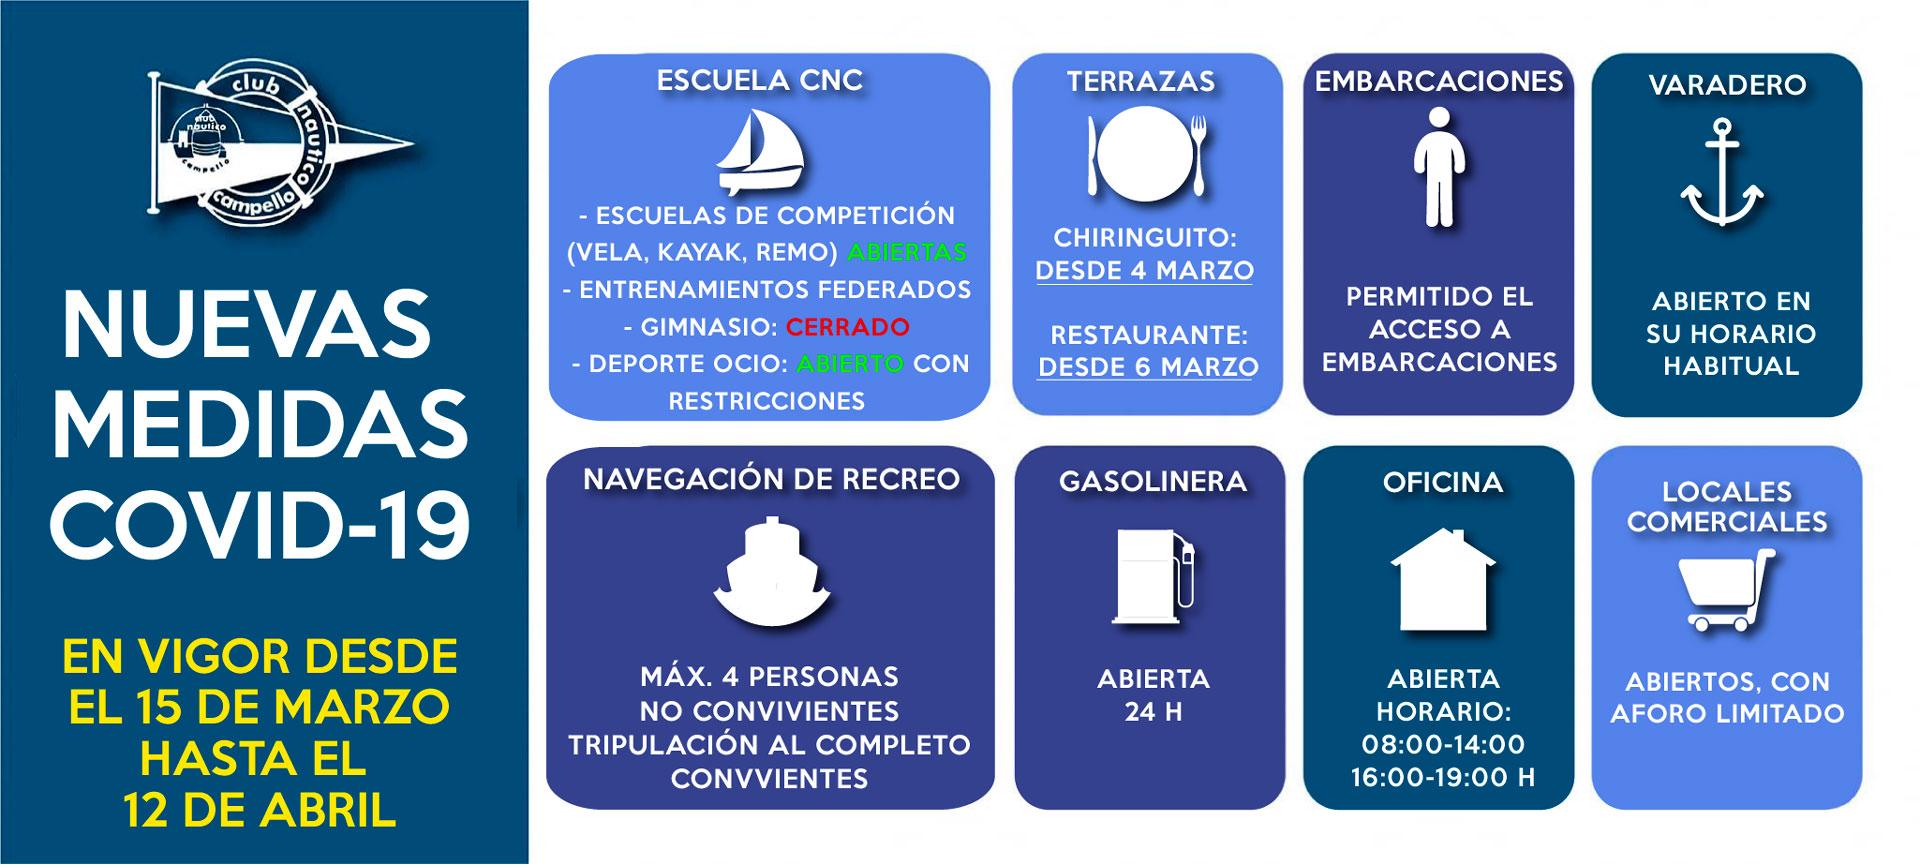 Medidas Covid-19 CNC